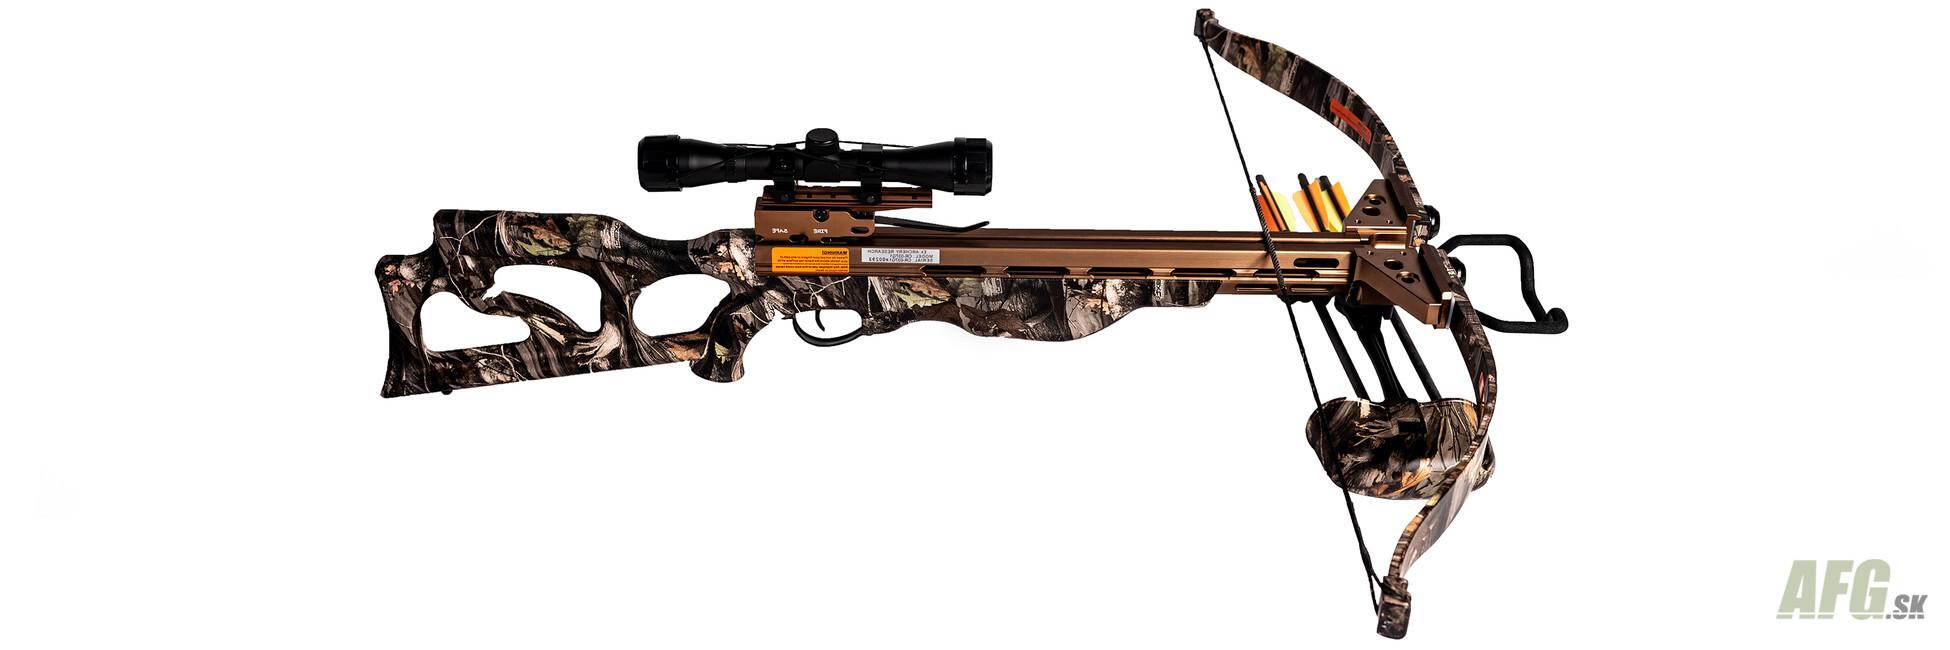 Crossbow recurve Ek-Archery Desert Hawk, camo, 225 lbs - AFG-defense